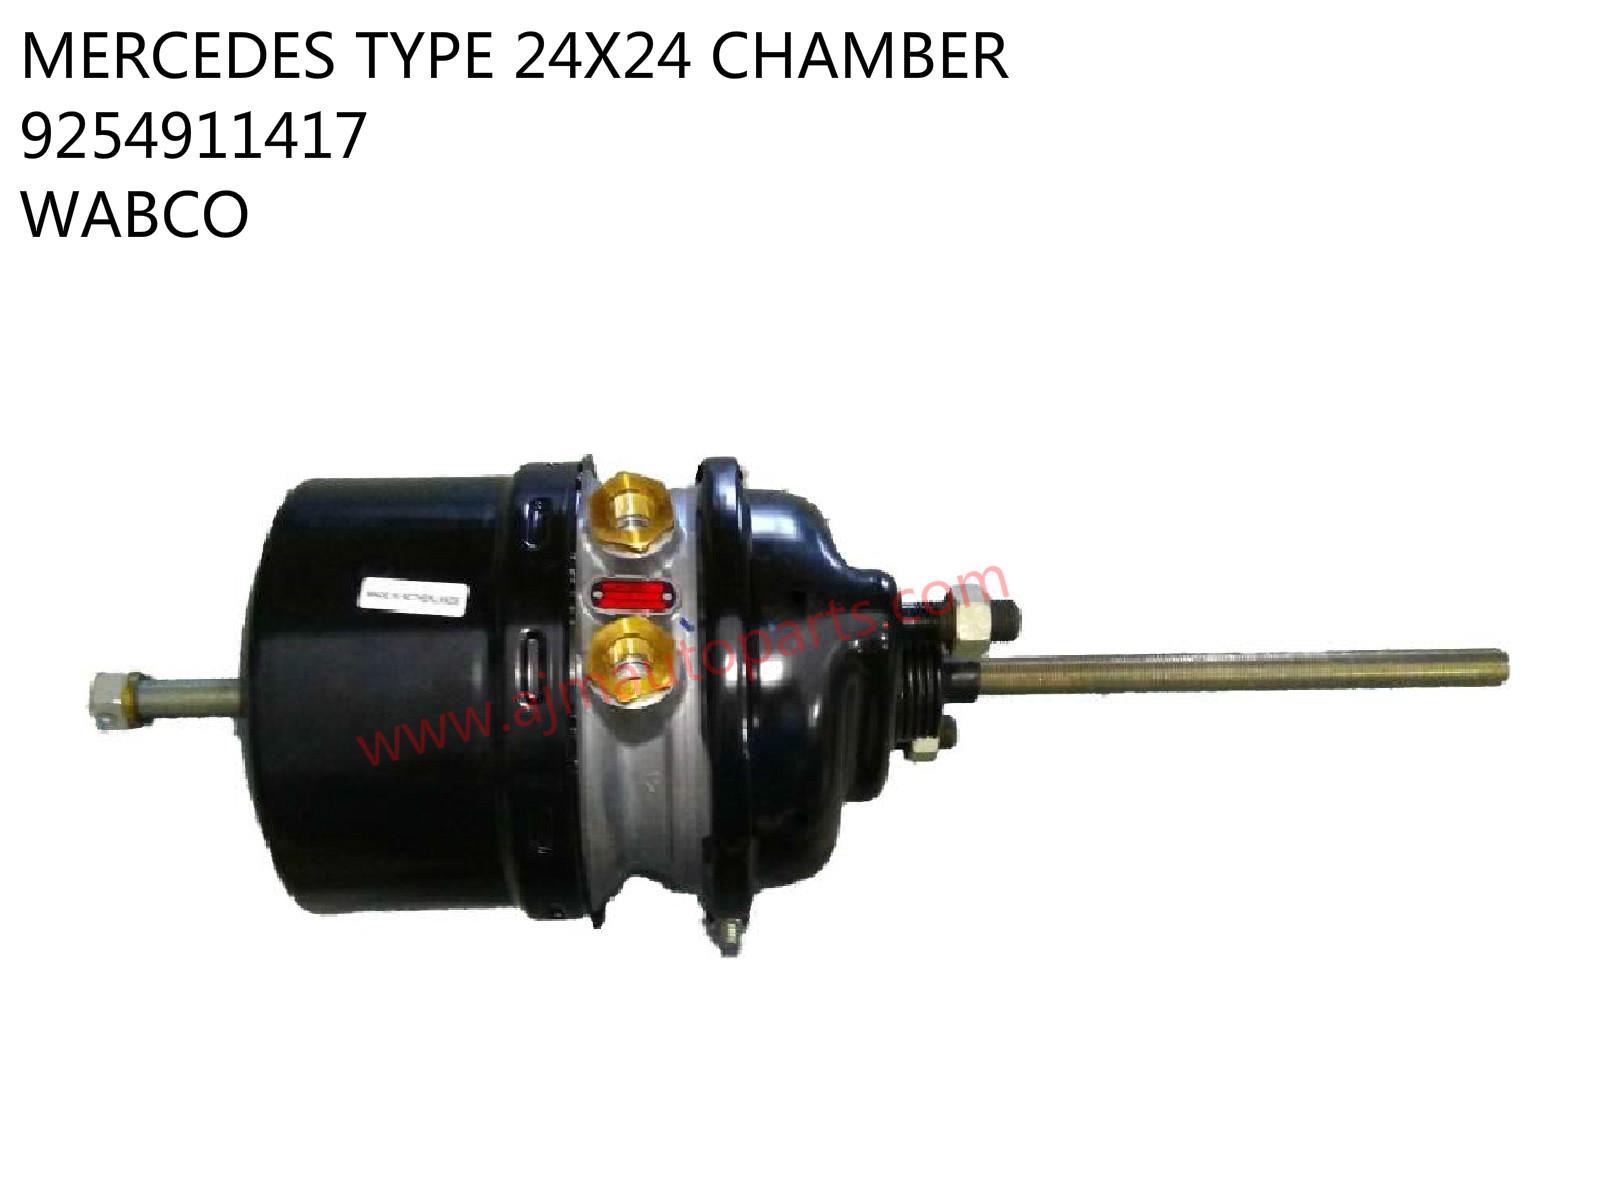 MERCEDES 24X24 CHAMBER-9254911417